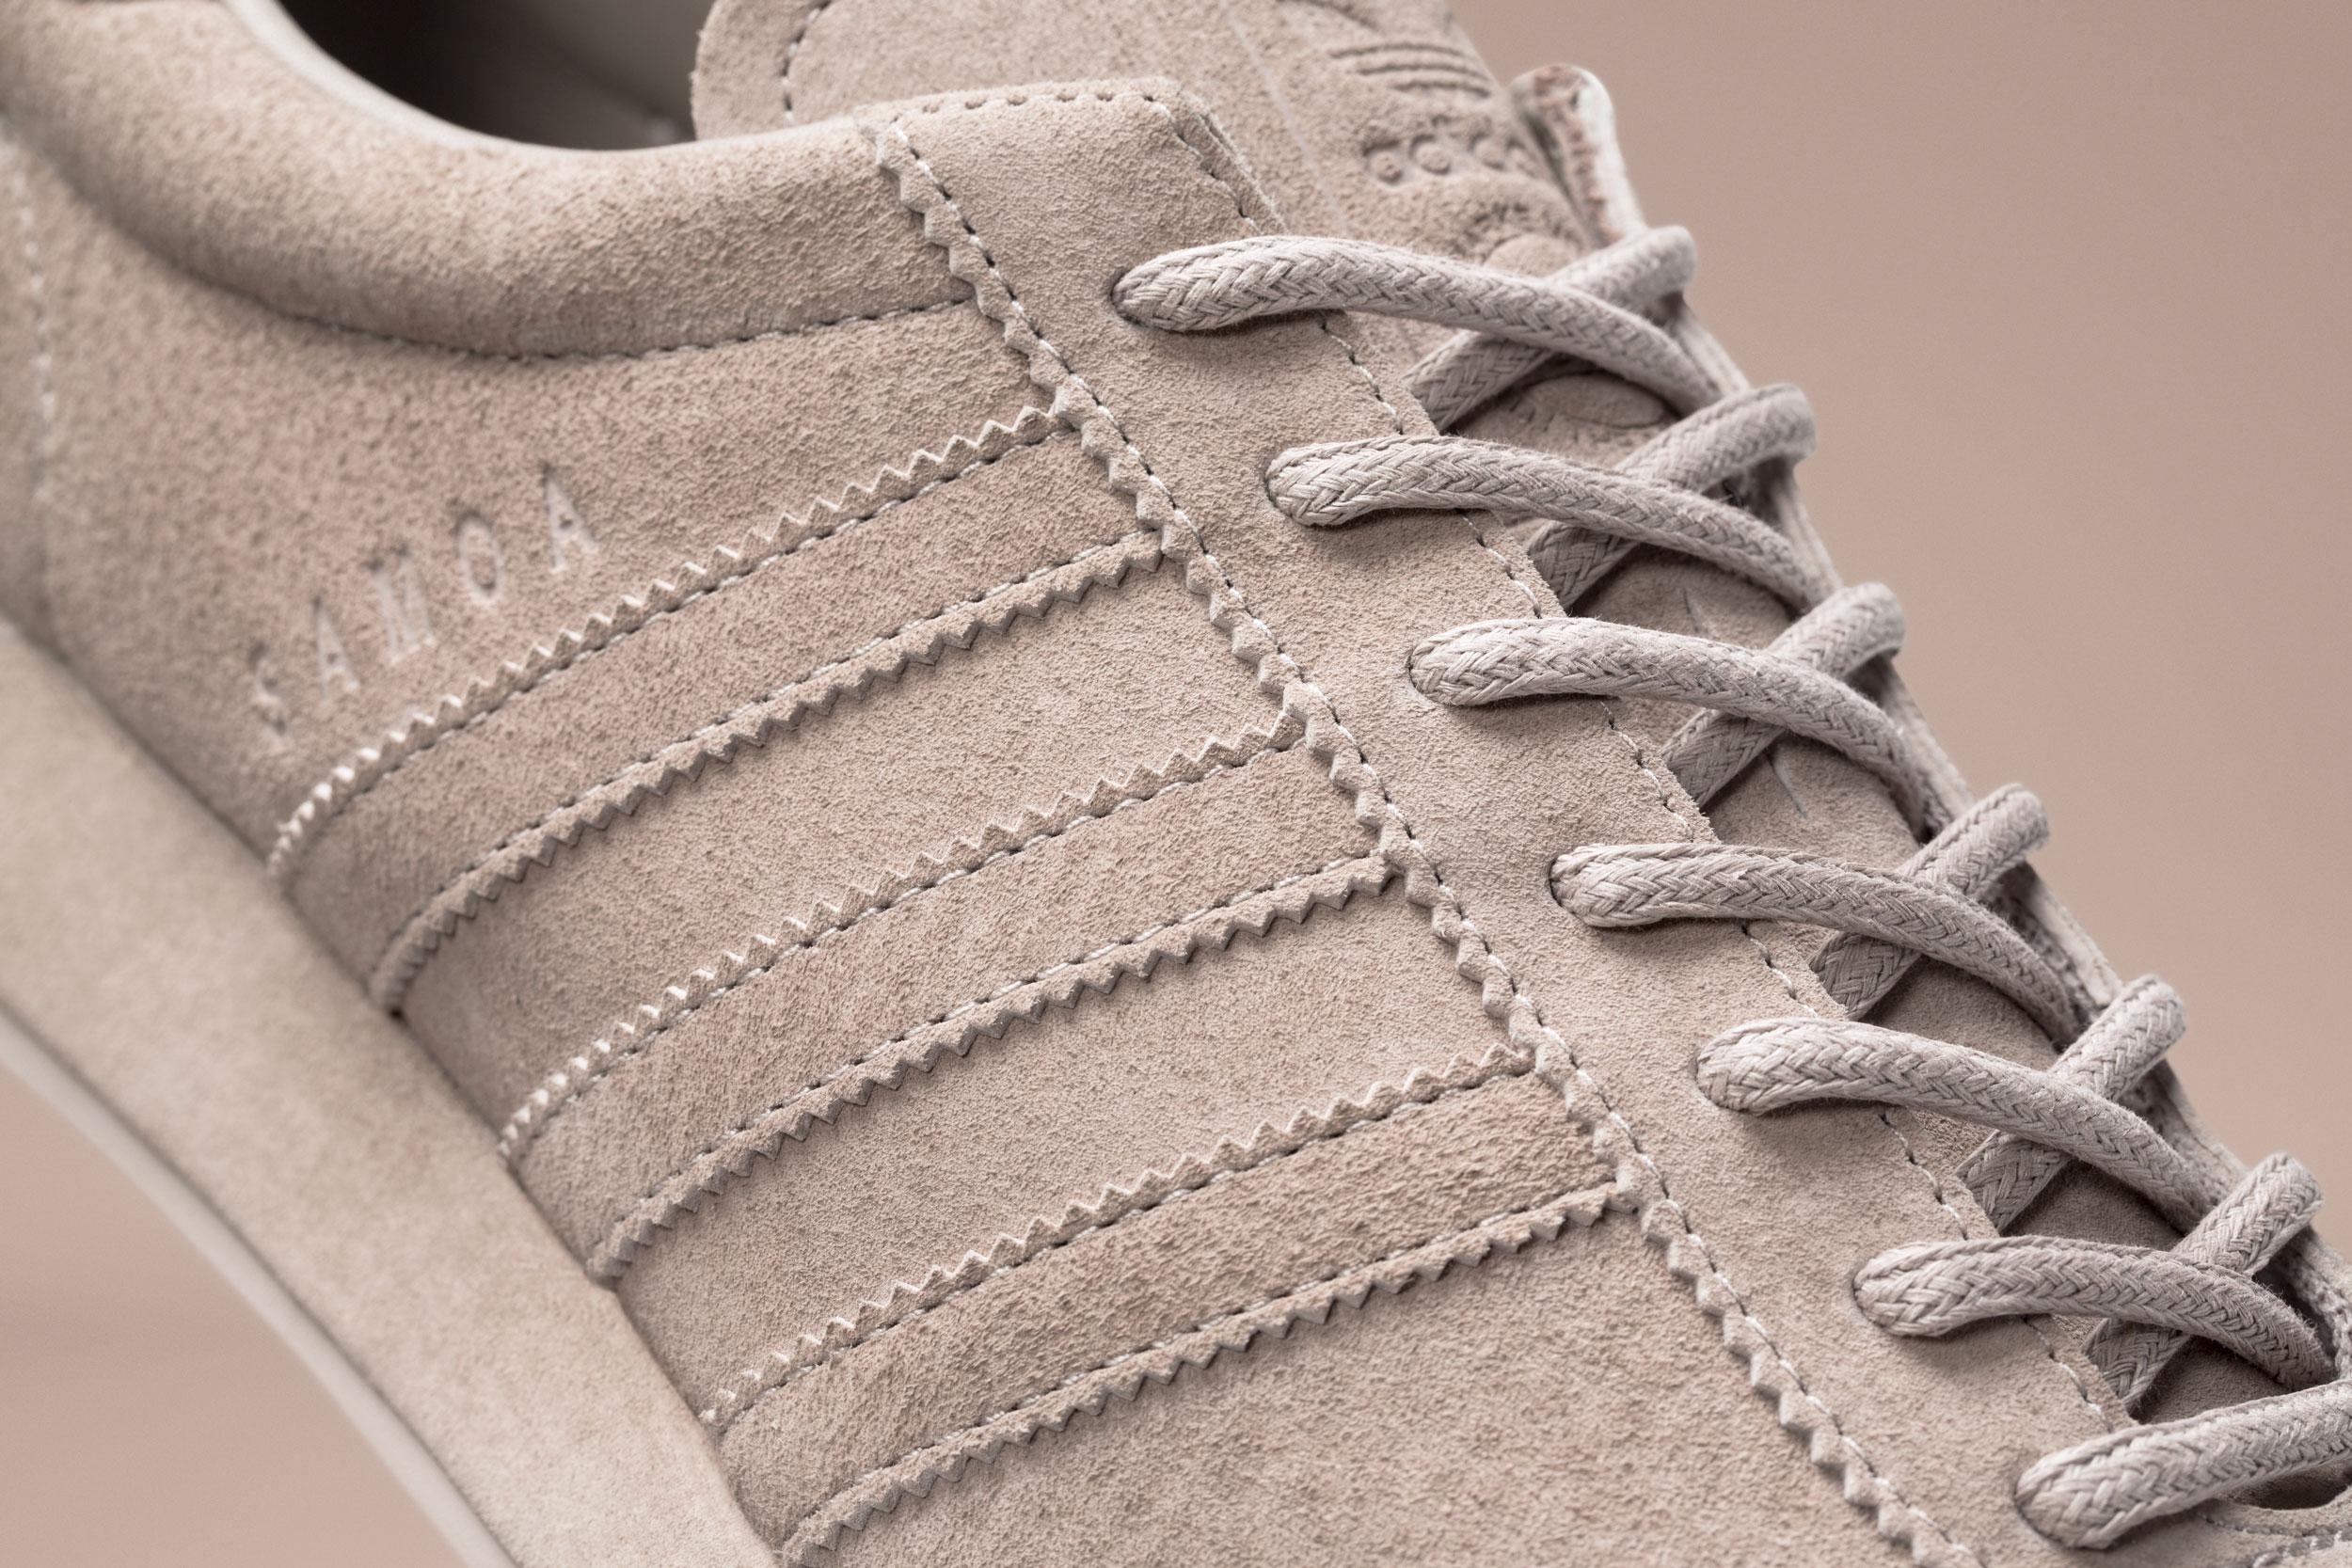 Adidas Samoa Pigskin Pack Vapour Grey